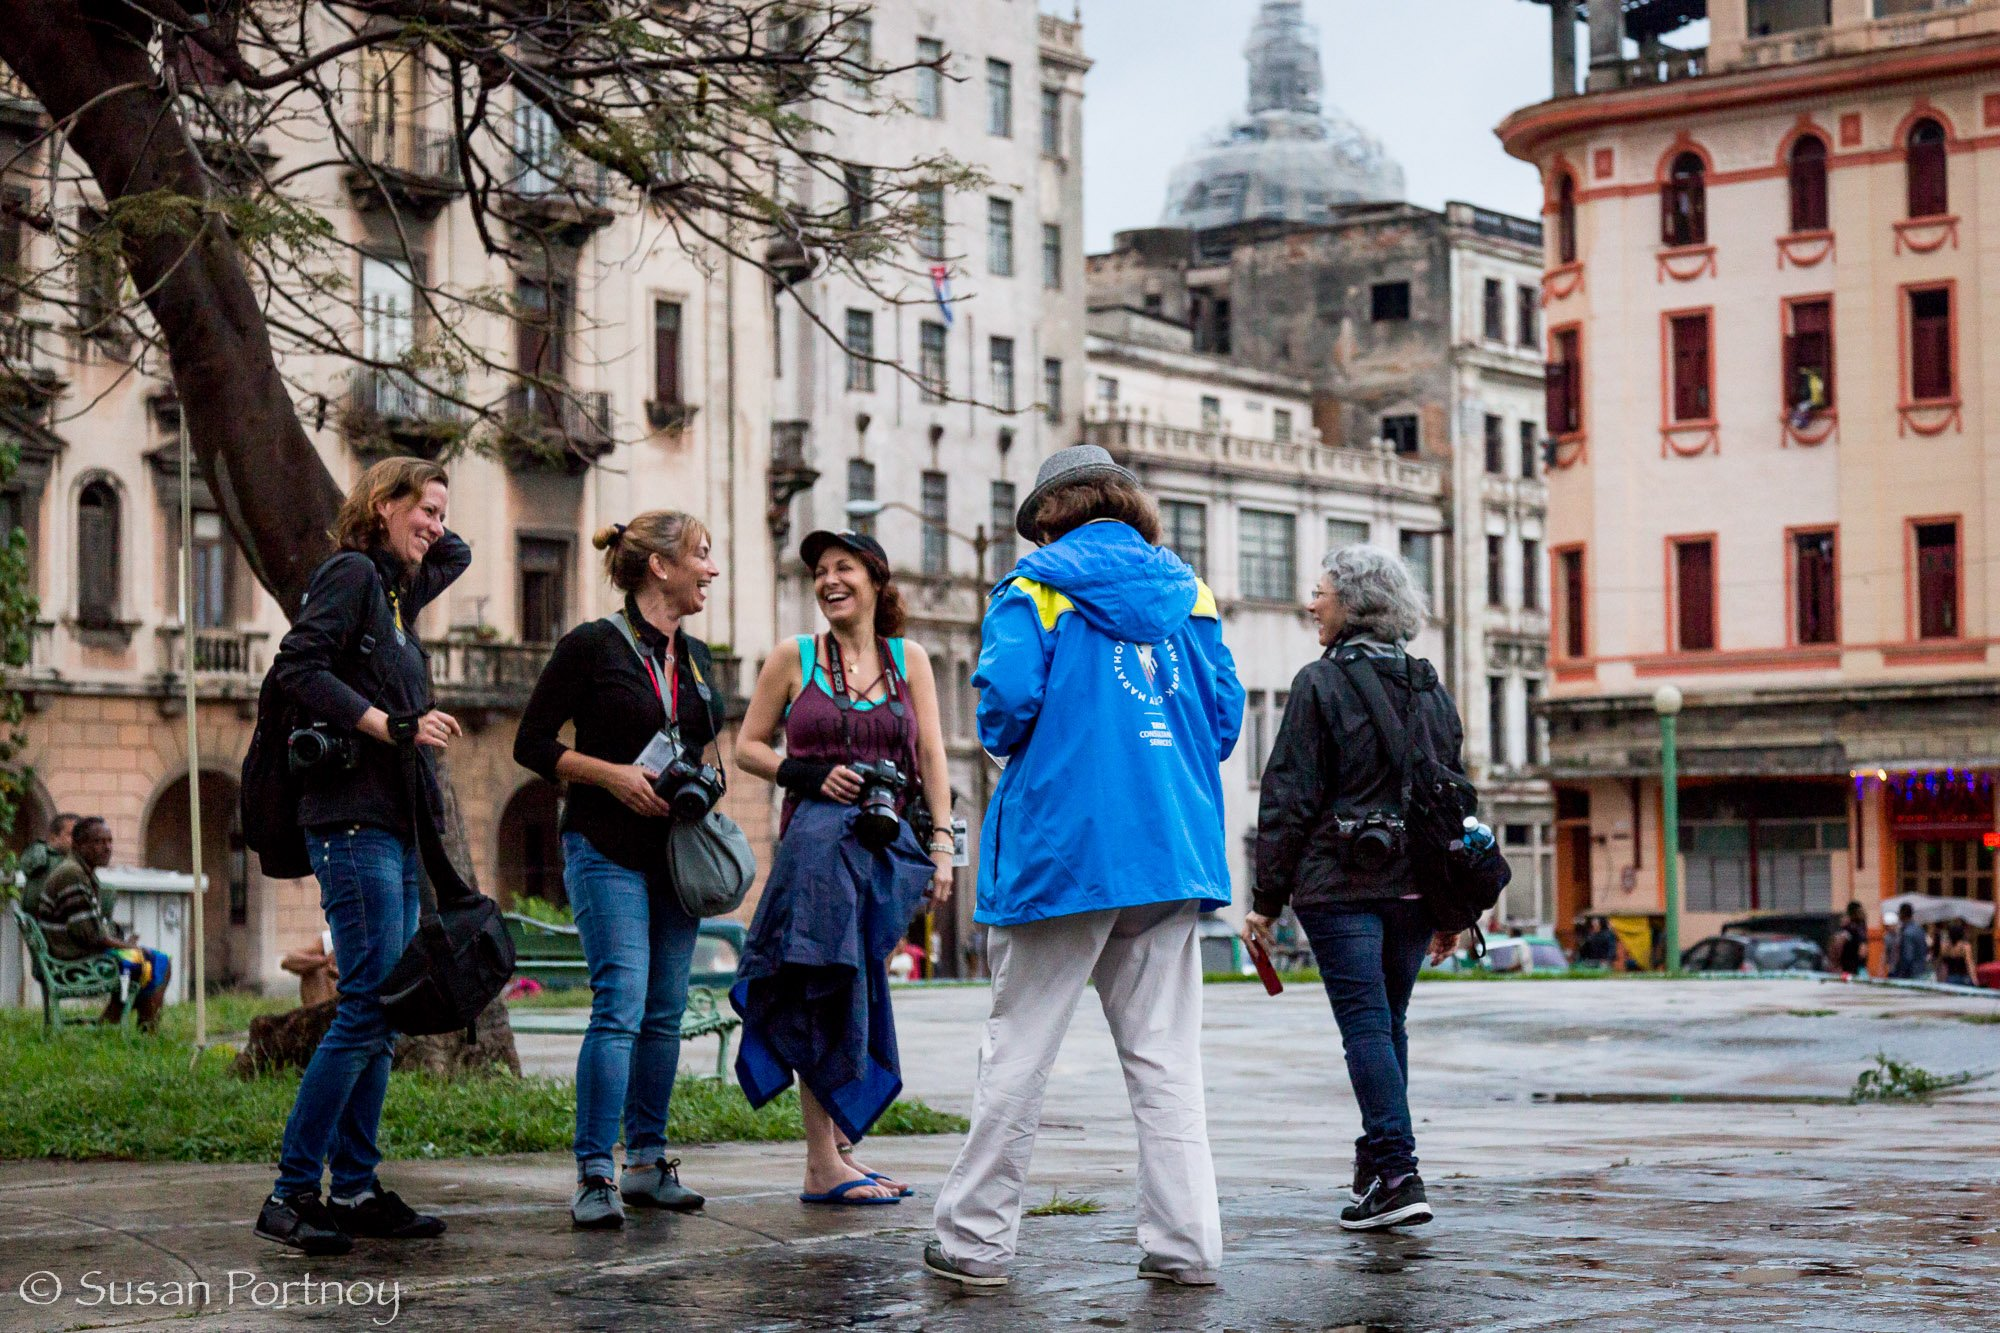 Photographers on a Santa Fe Photographic Workshops' tour of Cuba